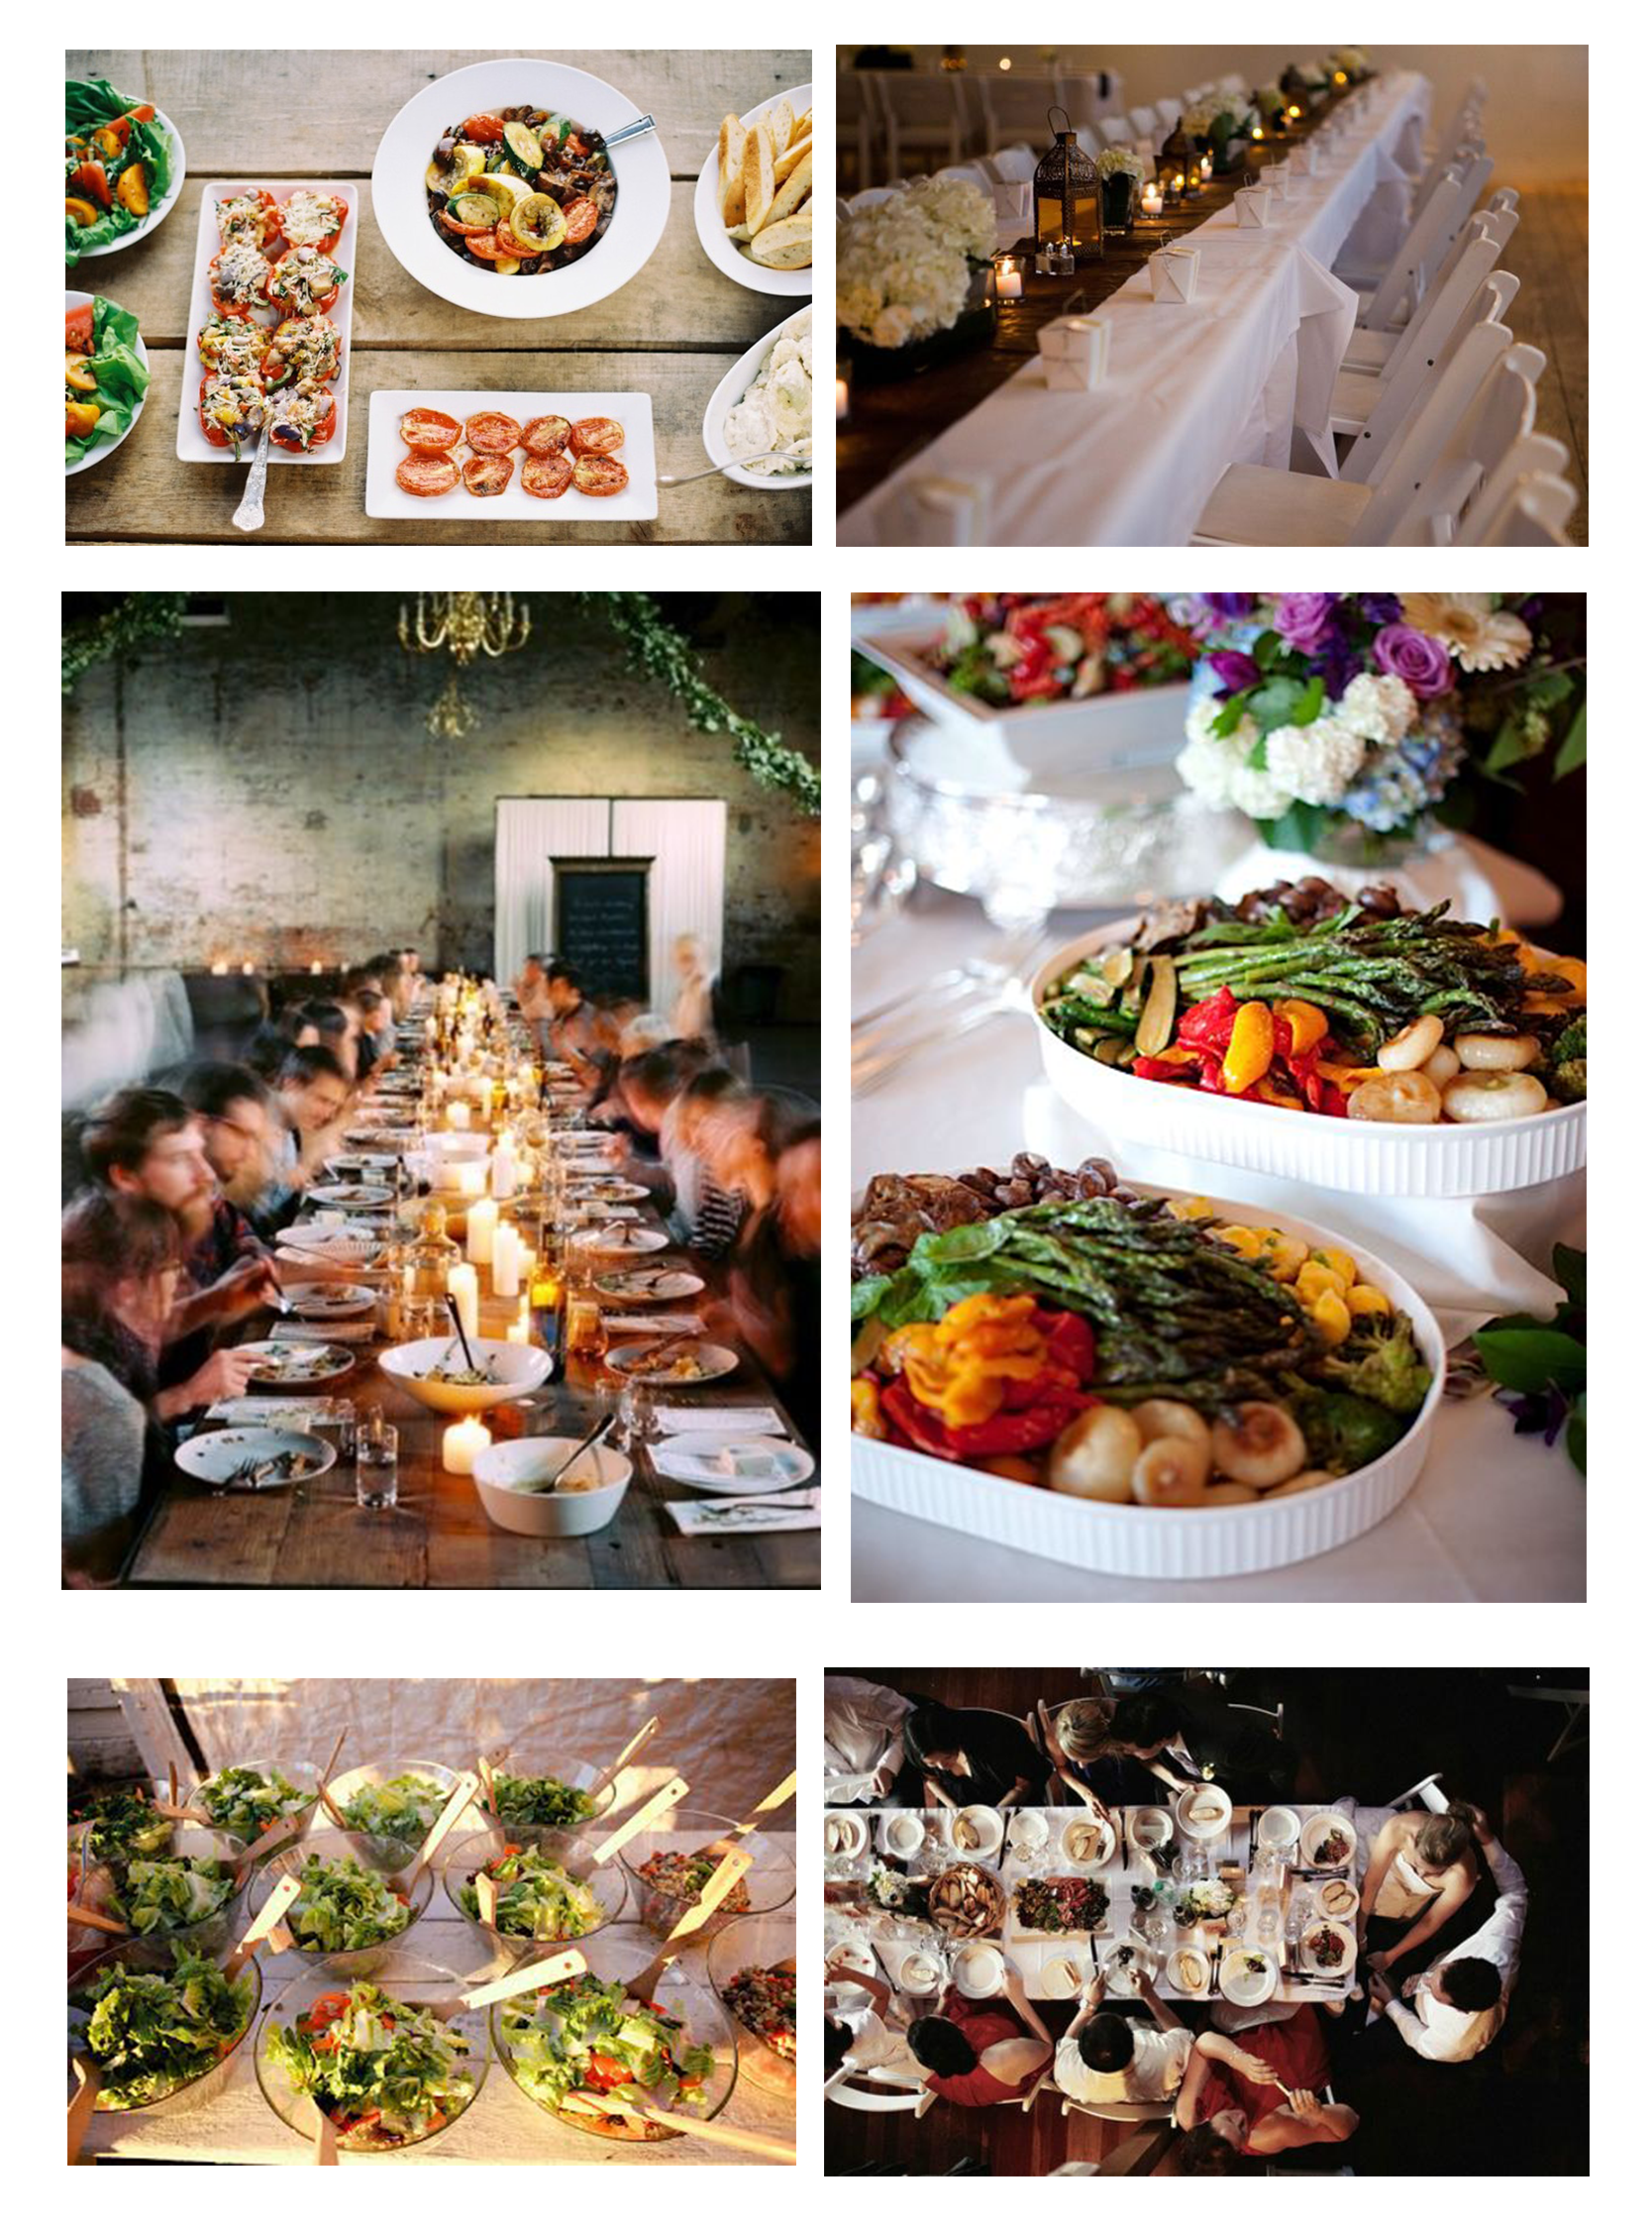 Trendy Tuesday- Family Style Wedding #weddingideas #weddingtrends  #familystylewedding   Family style dinner, Wedding food drink, Reception  food